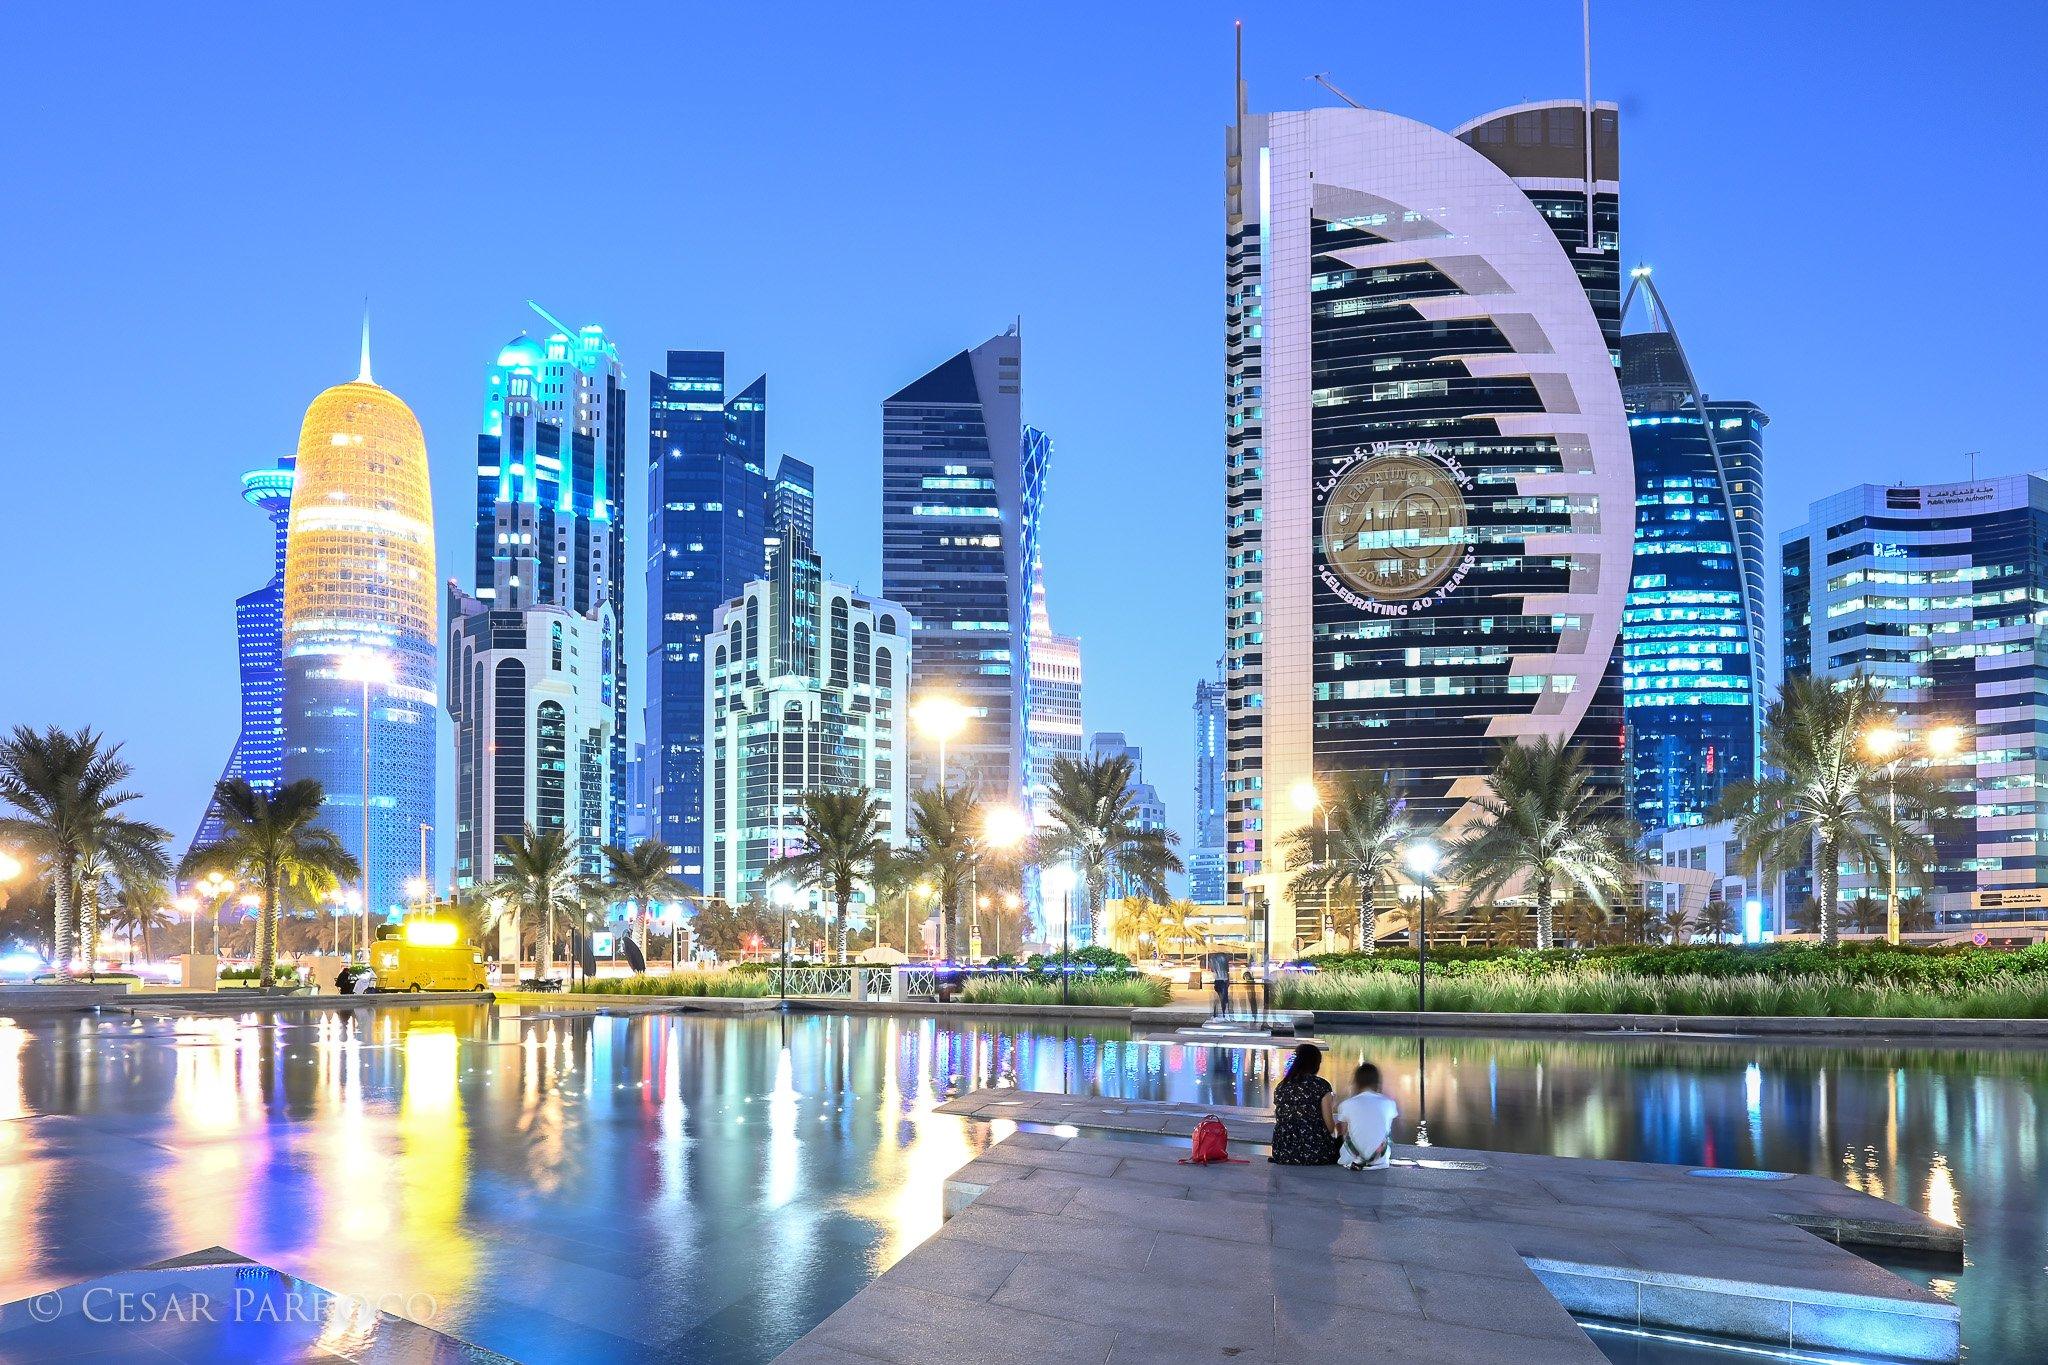 Google data center in Qatar - Cover Image